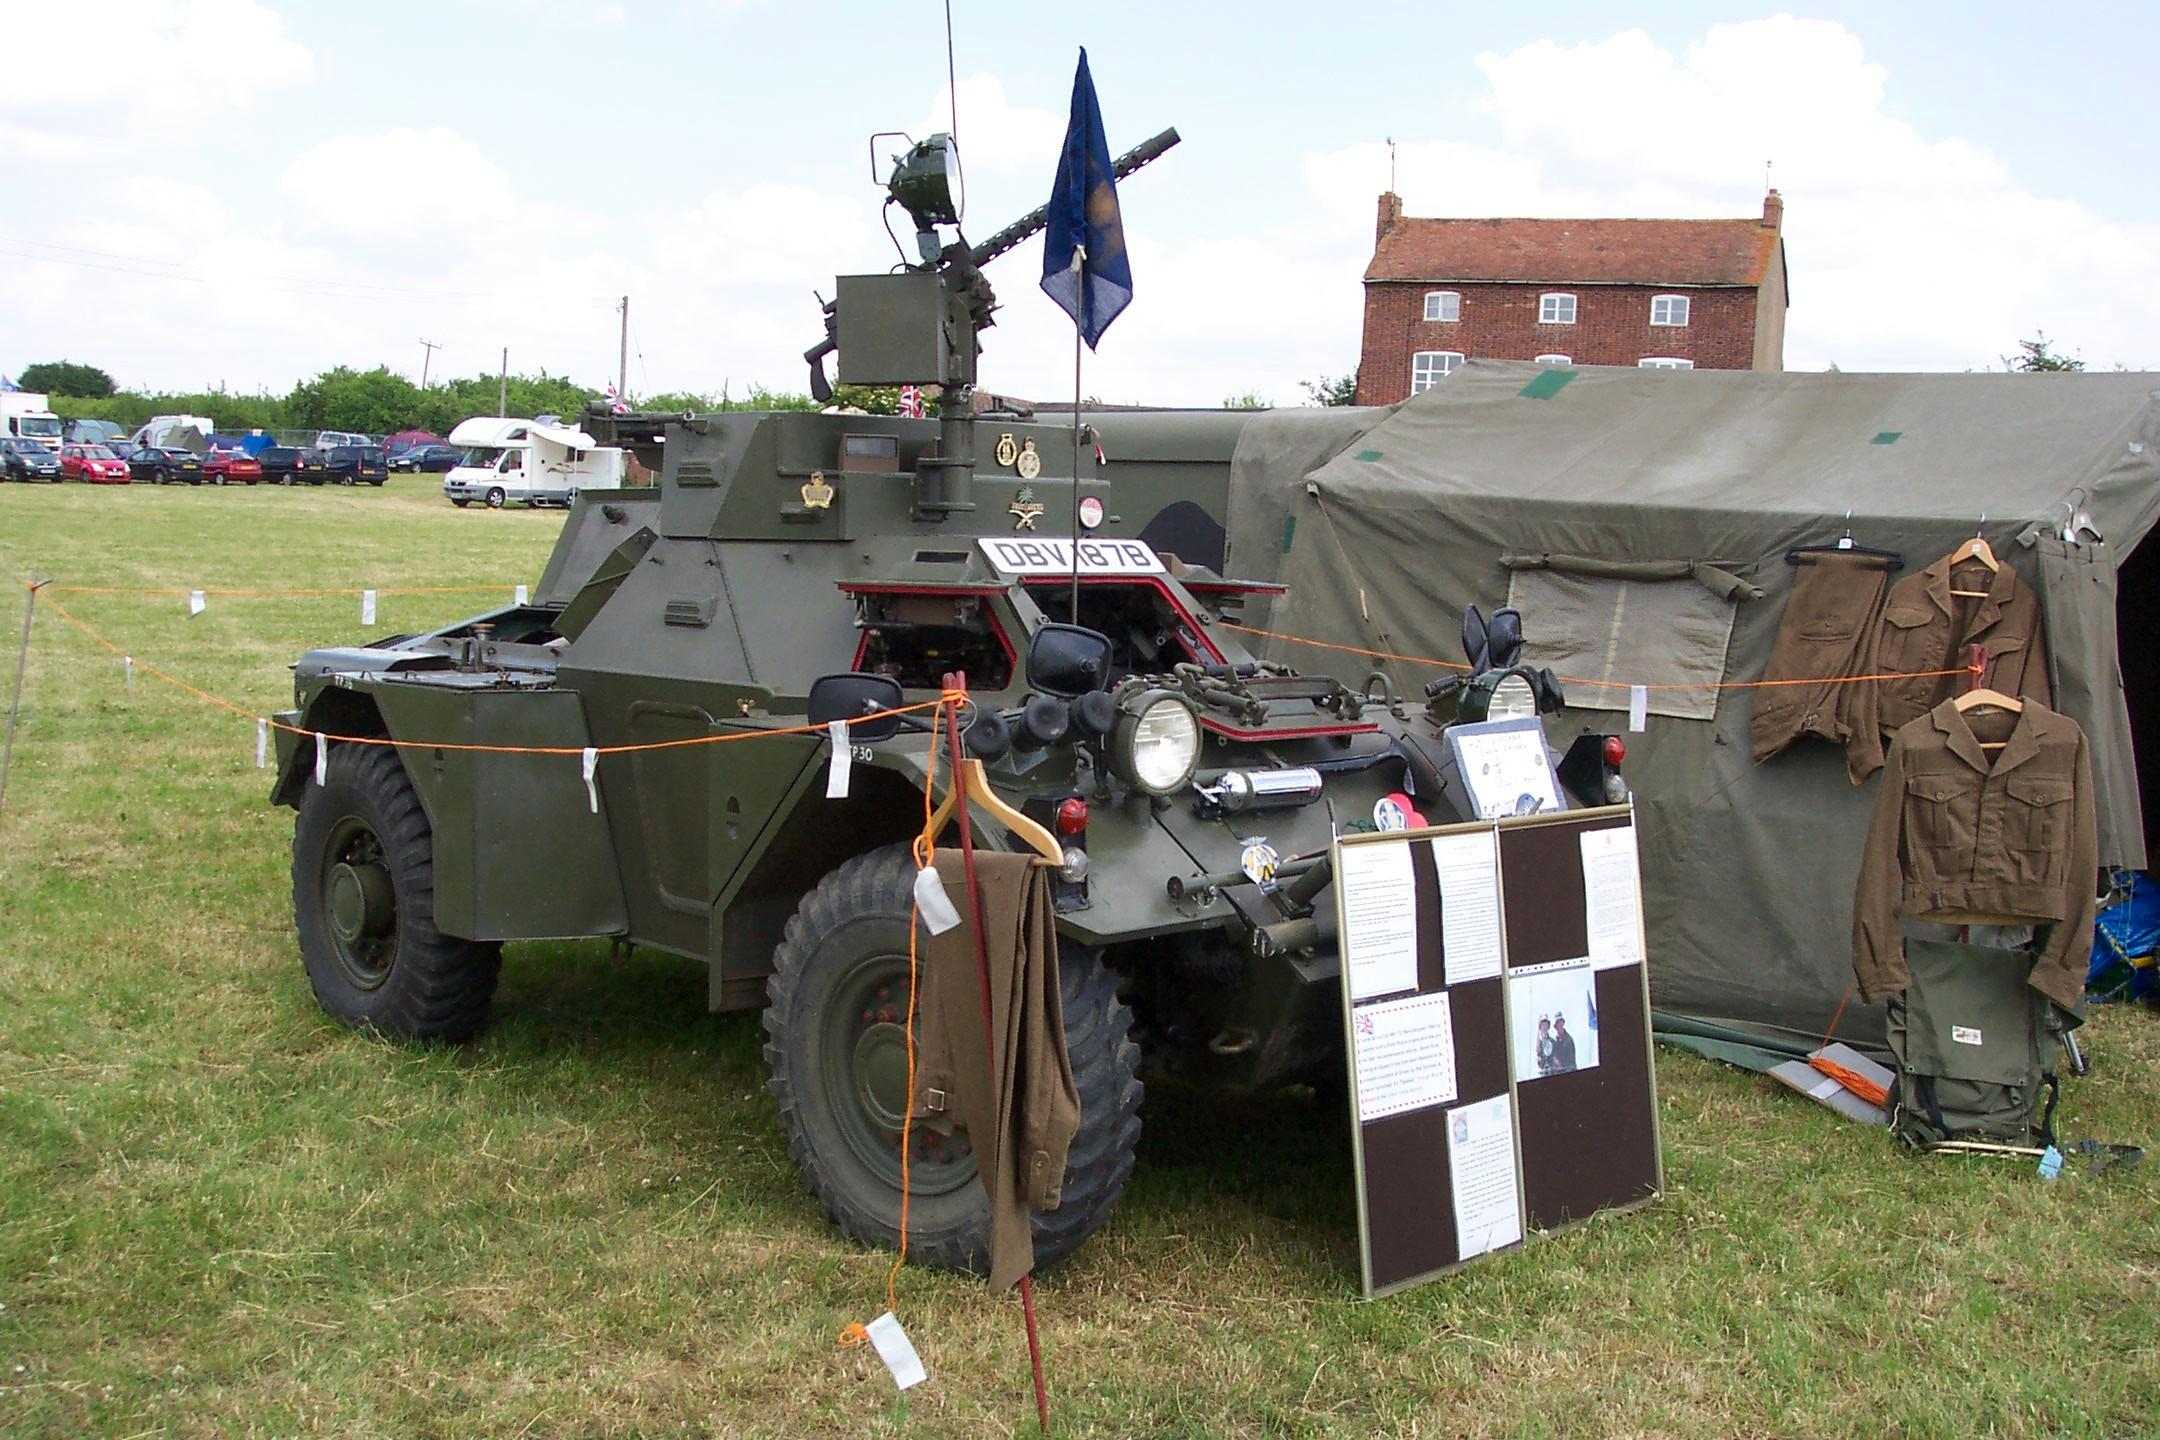 1960 Ferret Armored Scout Car Fv701 Mk 23 For Sale.html | Autos Weblog